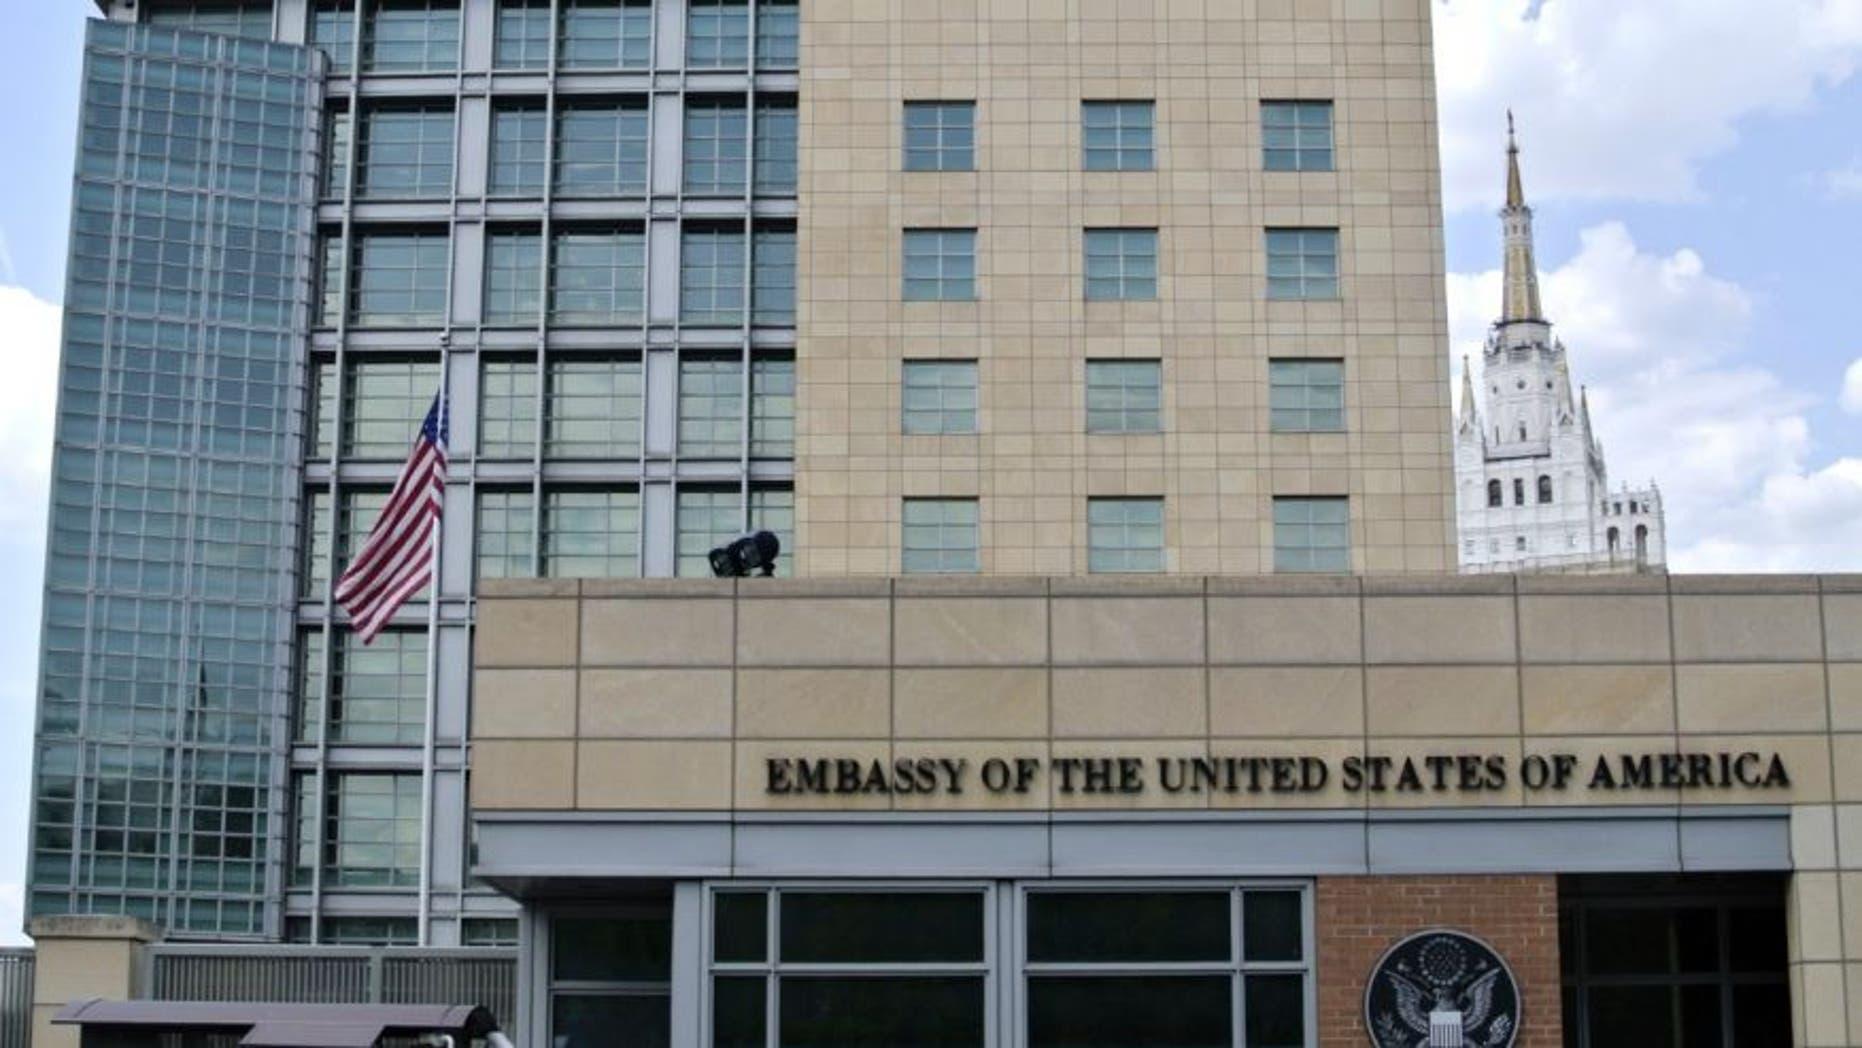 The U.S. Embassy in downtown Moscow. (AP Photo/Ivan Sekretarev)